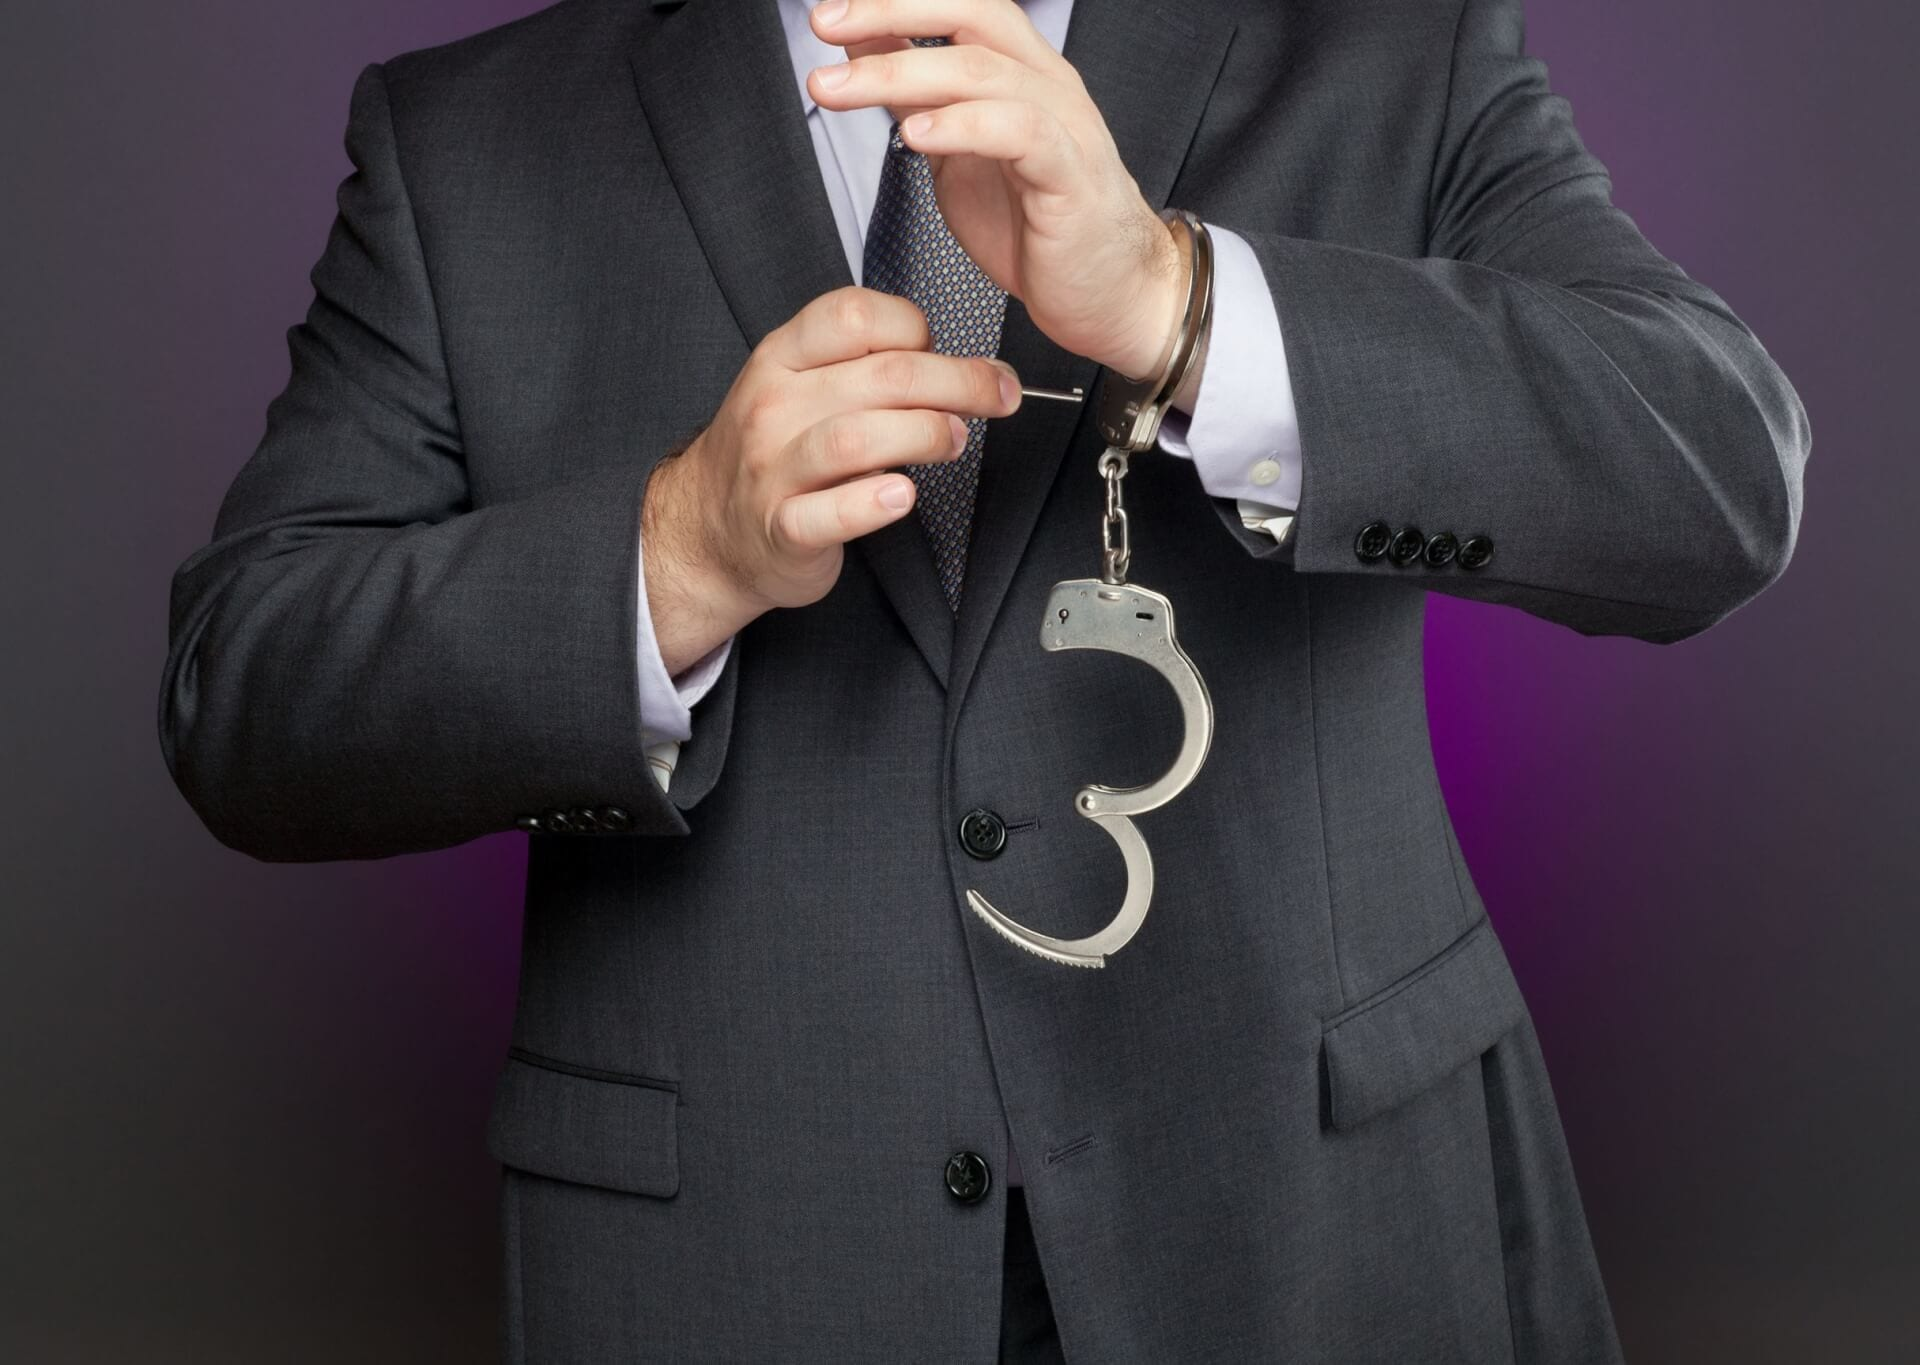 Fort Worth Drug Trafficking Lawyer